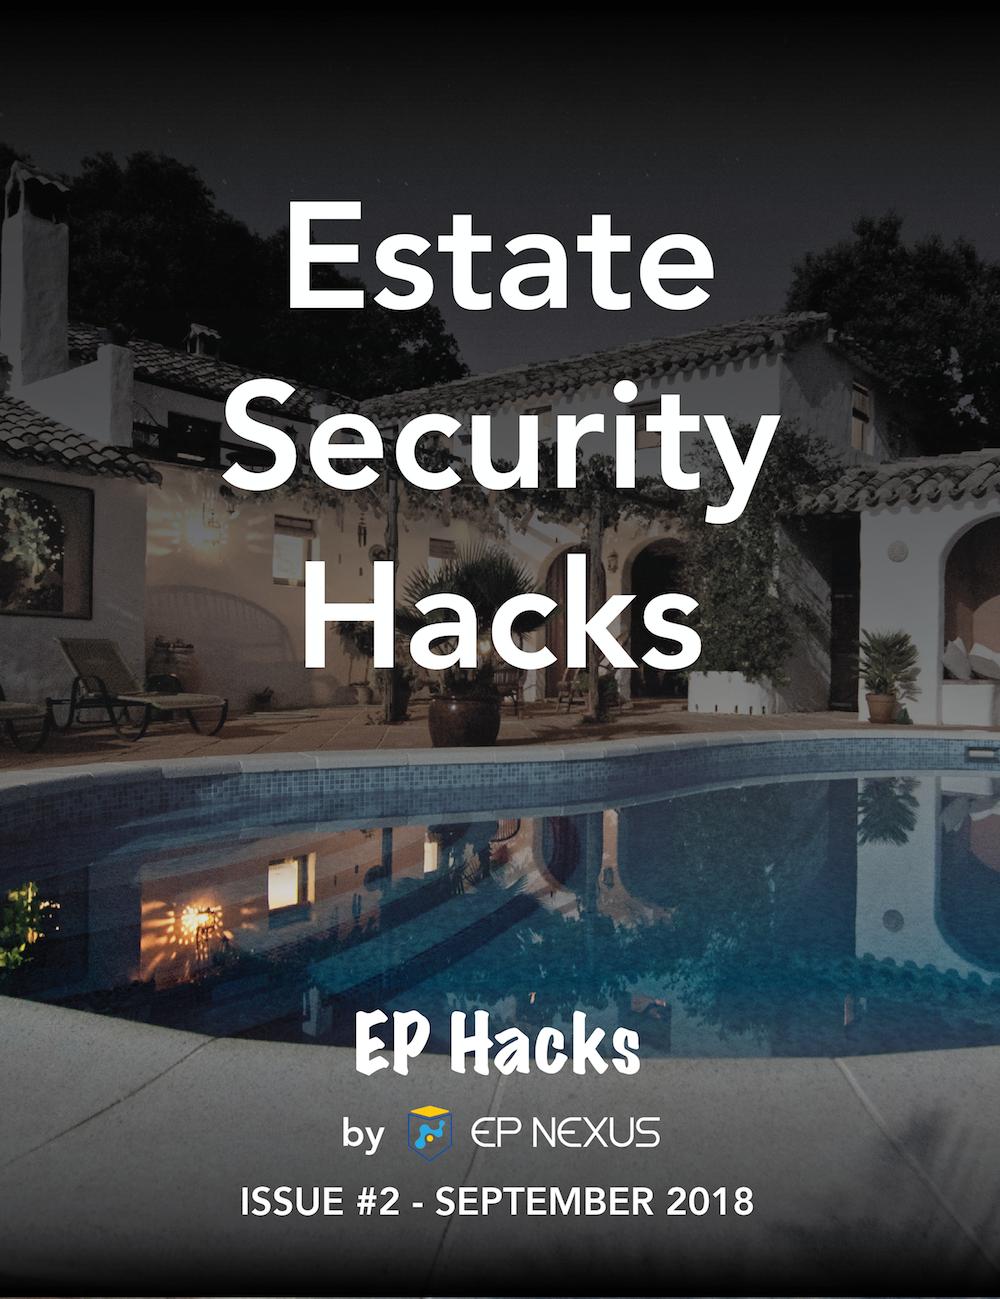 EP Nexus | Executive Protection | Estate Security Hacks